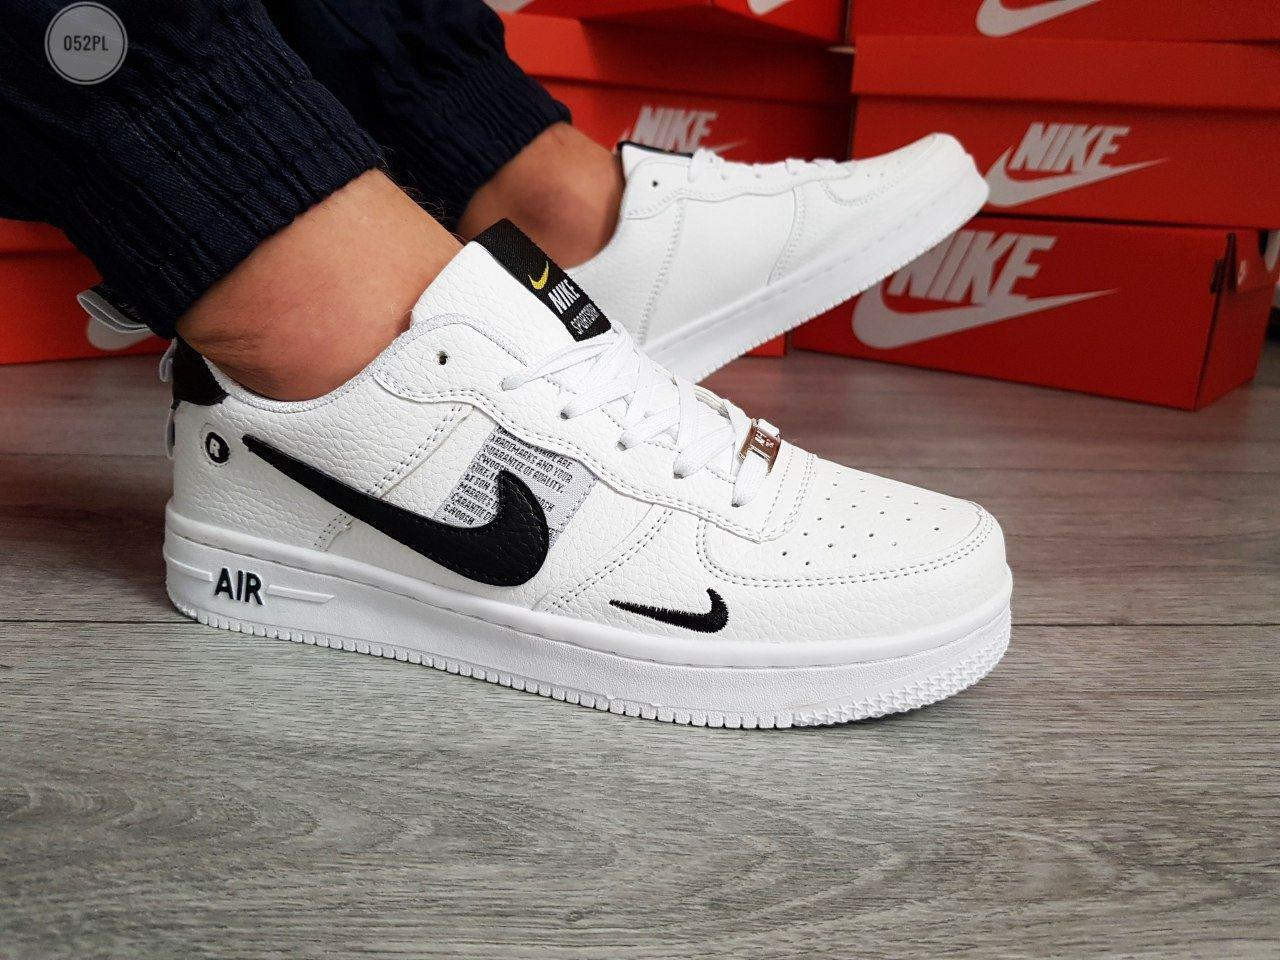 Мужские кроссовки Nike Air Force 19 Low White/Black (р. 40 41 42 43 44) Белые